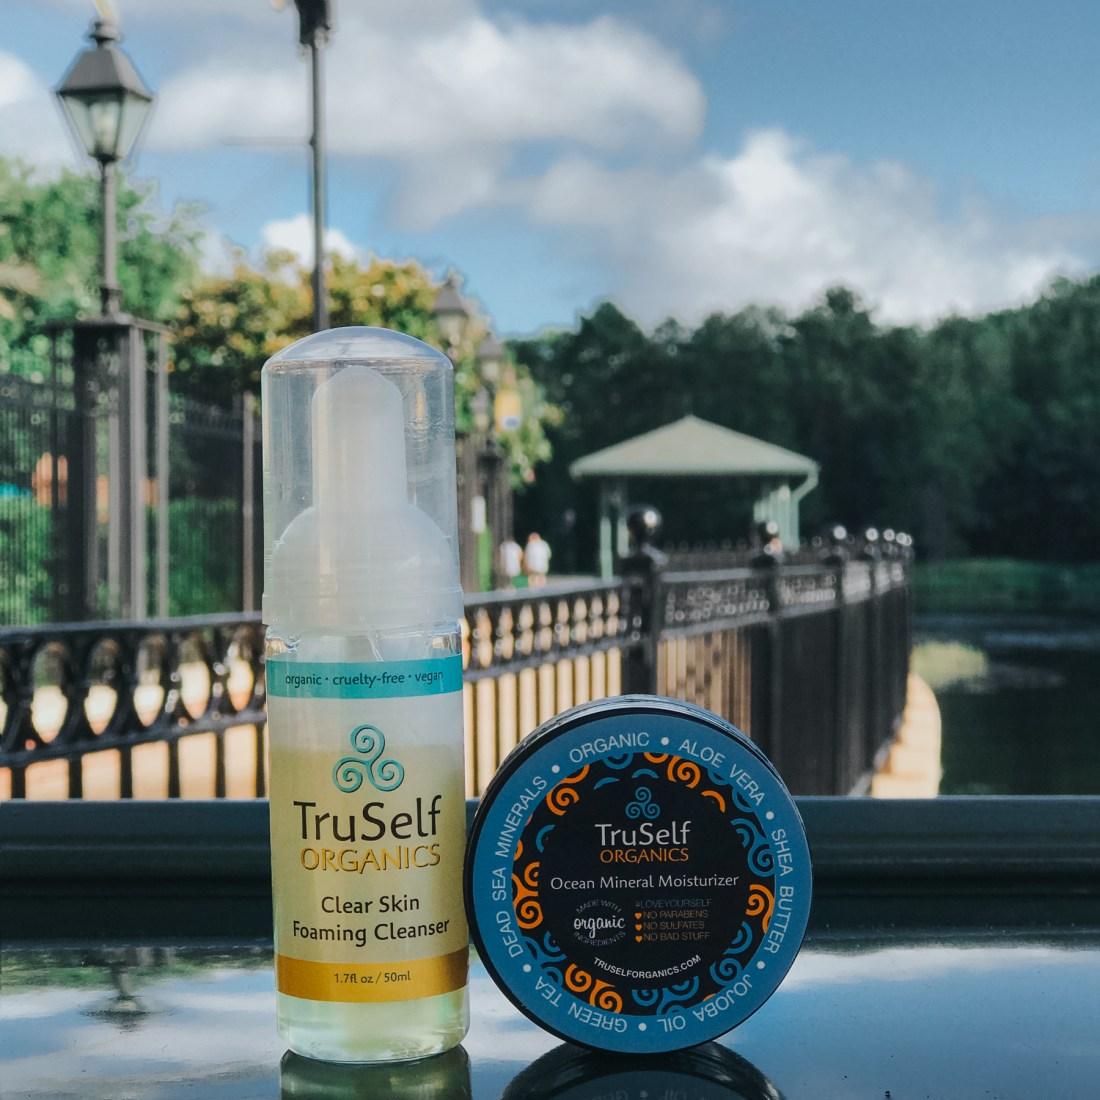 TruSelf Organics Ocean Mineral Moisturizer + Clear Skin Foaming Cleanser, Organic Skincare, leaping bunny certified, cruelty-free skincare, cruelty-free brands | @truselforganics